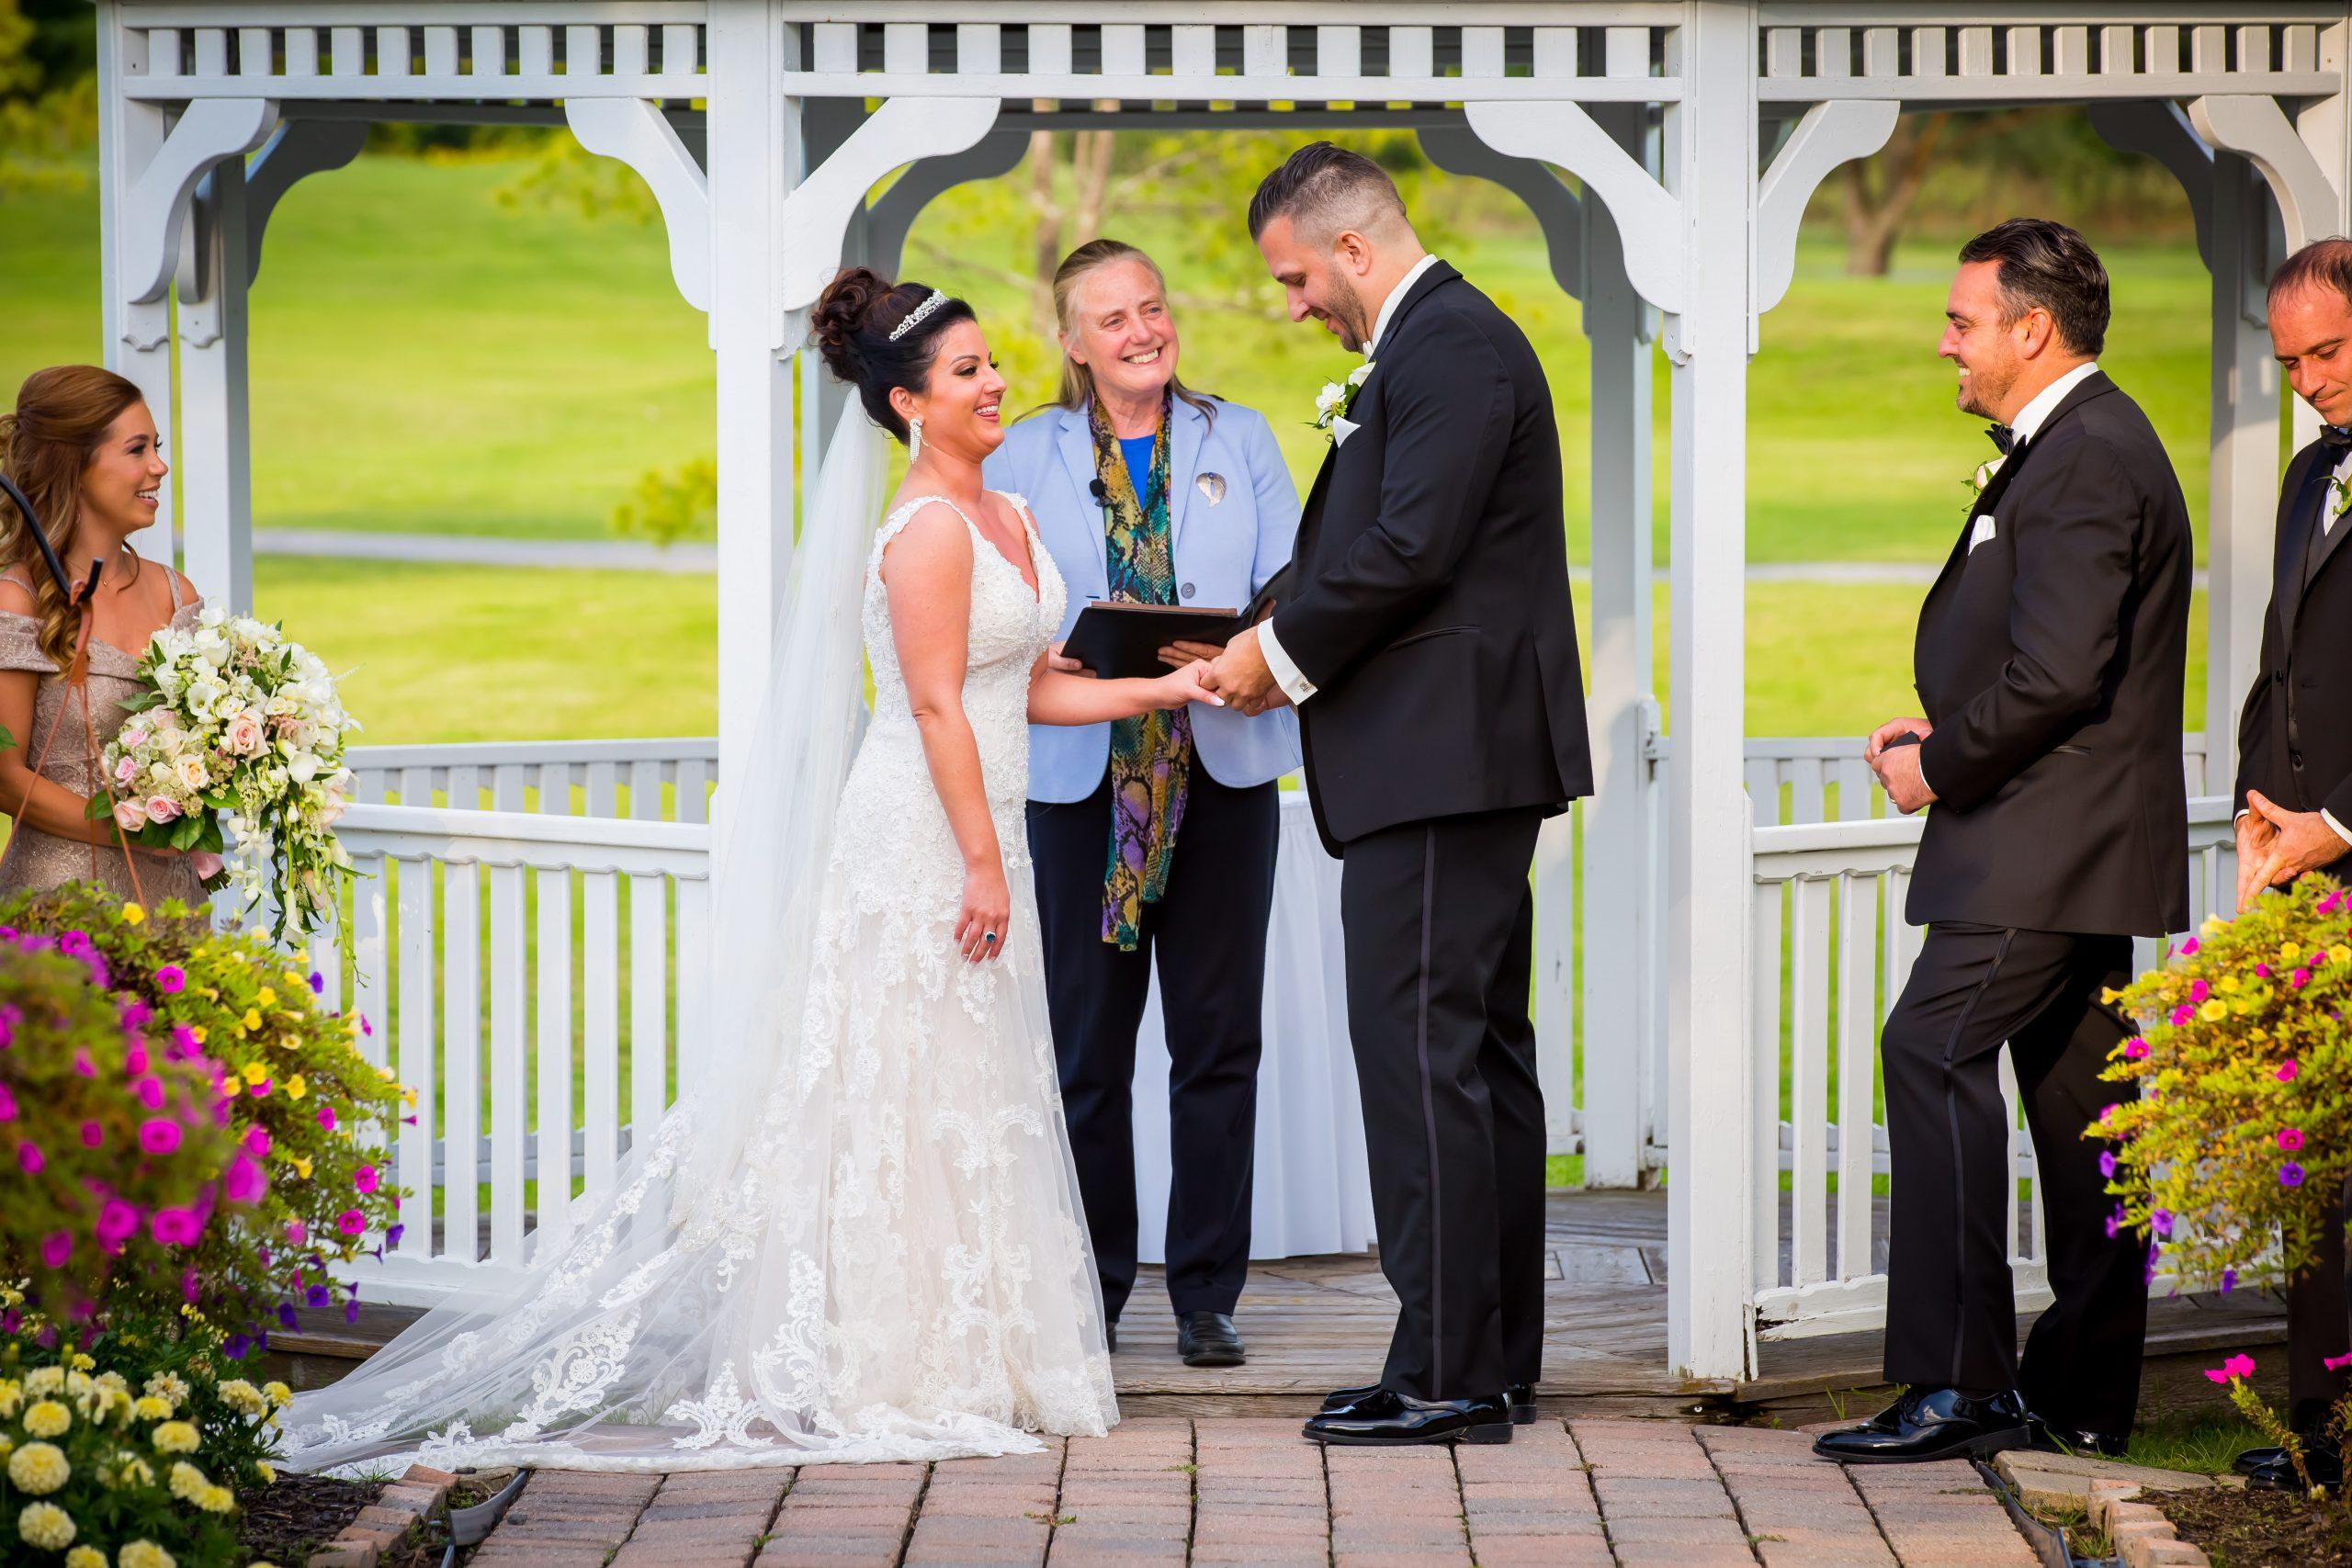 Victori_Rob_Mohawk River Country Club Wedding-29.jpg